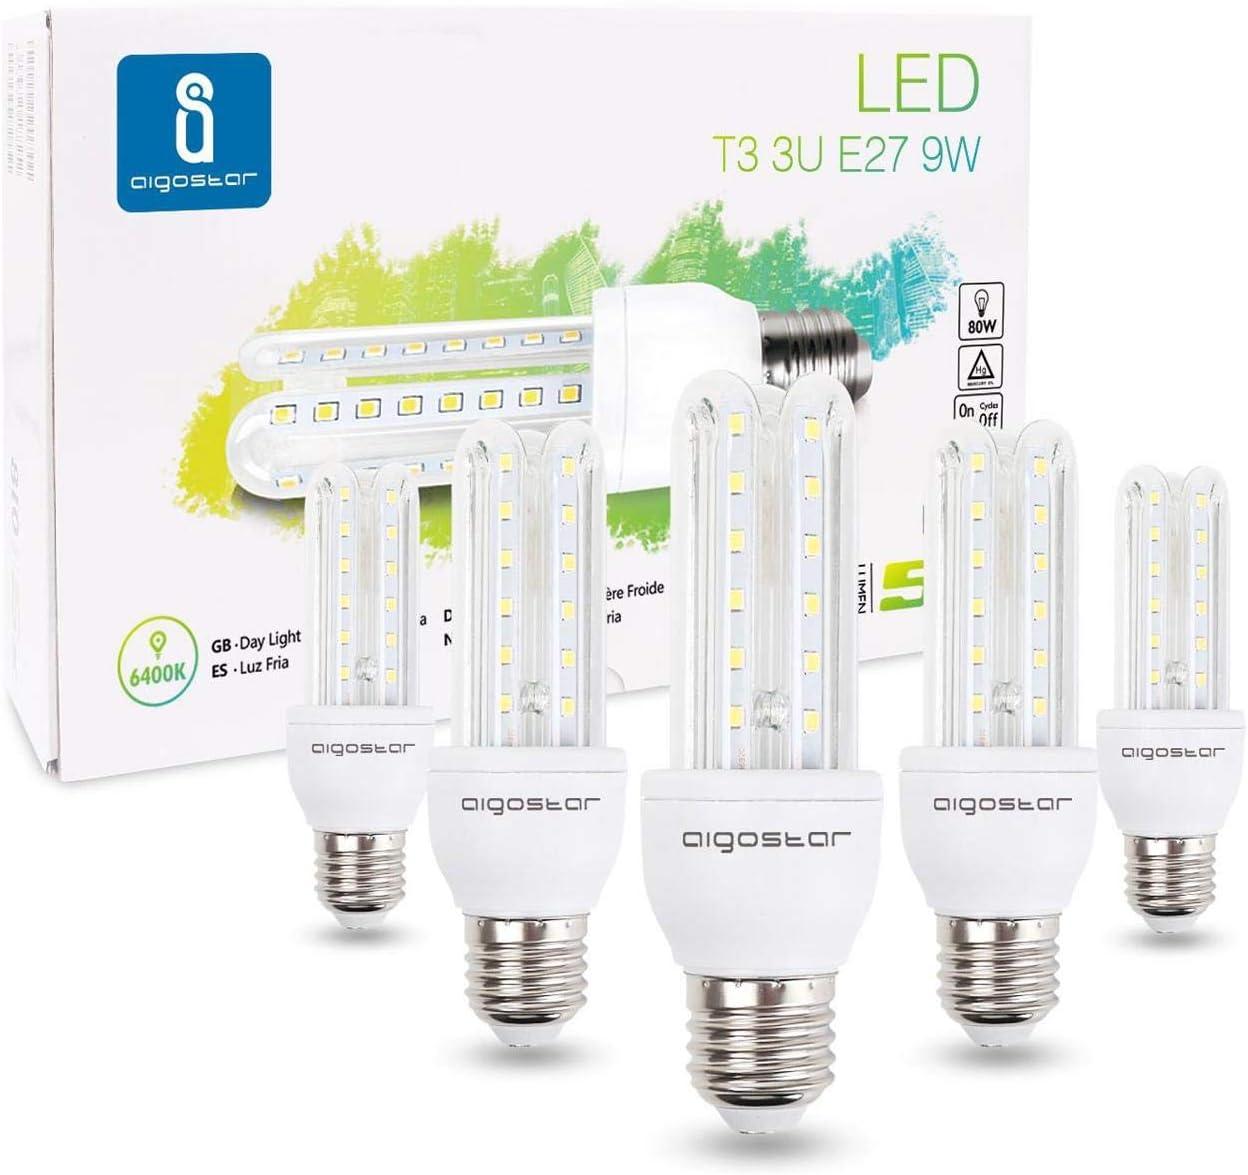 Aigostar - Bombilla LED B5 T3 3U, E27, 9 W equivalente a 80 W, Luz blanca fría 6400K, 810 lúmenes, no regulable - Caja de 5 unidades [Clase de eficiencia energética A+]